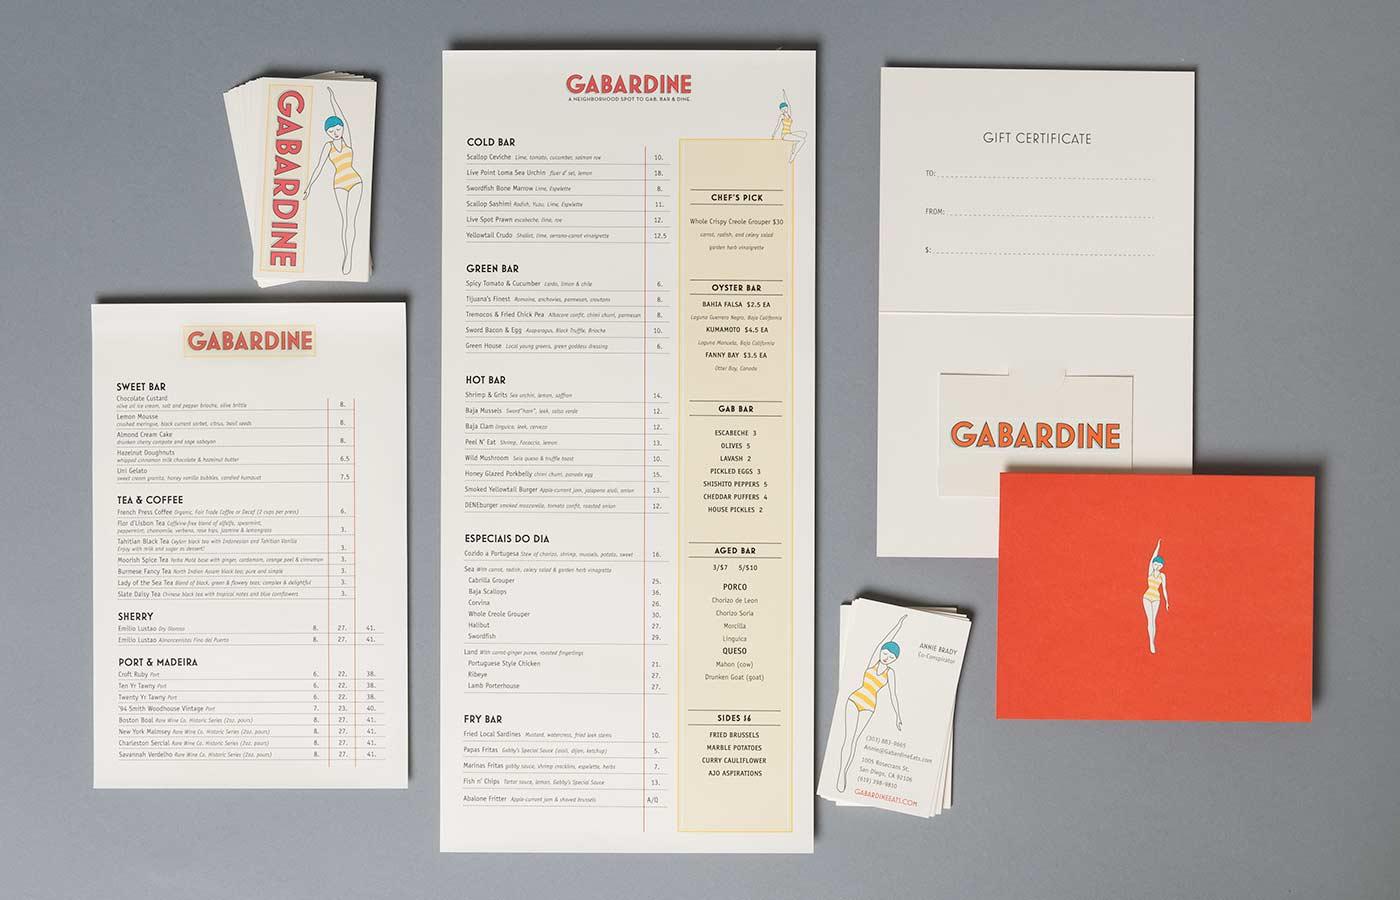 gabardine_menu_system